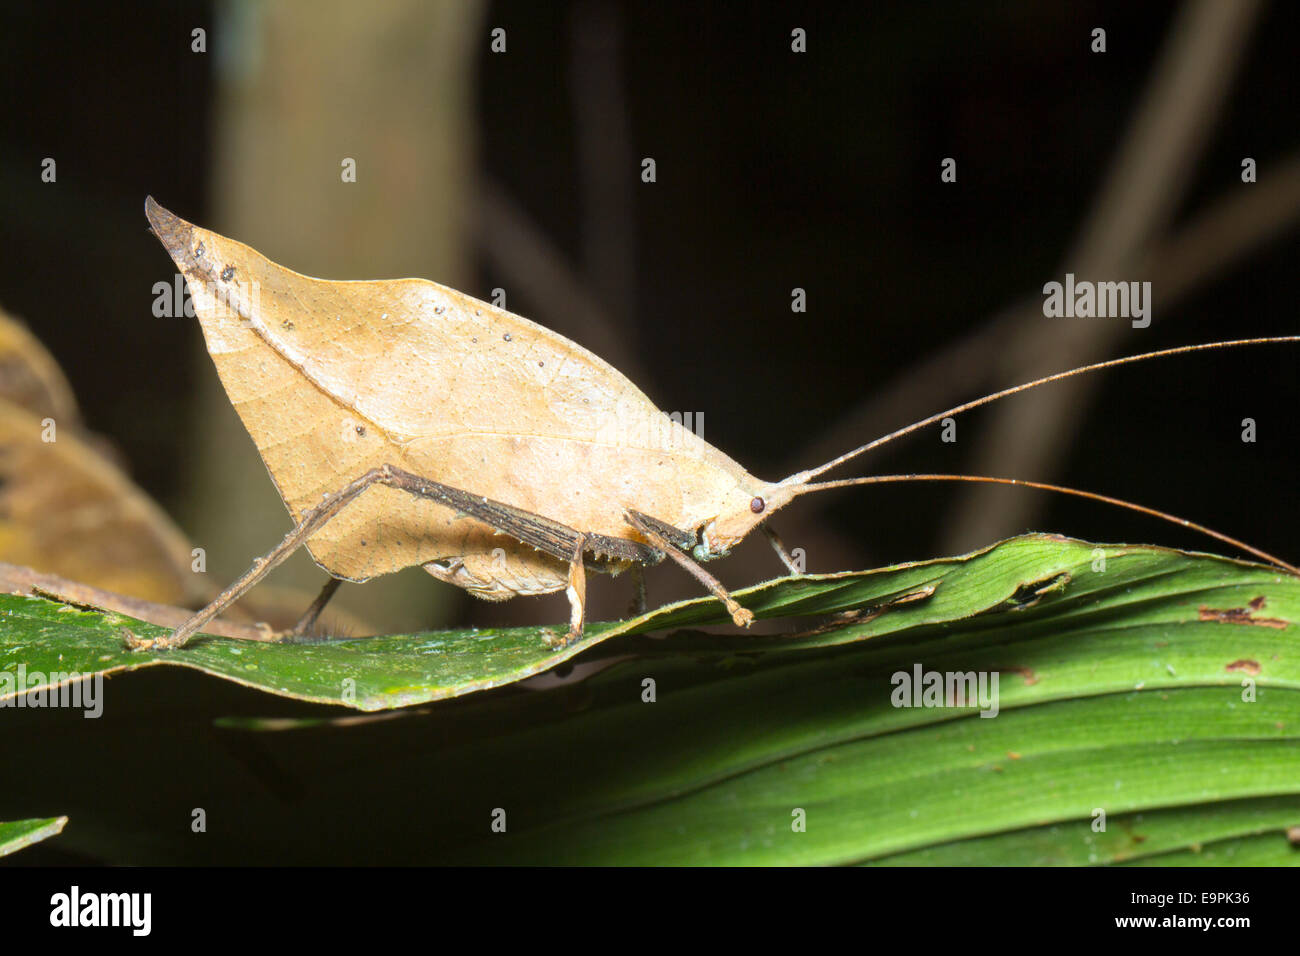 Leaf mimic katydid in the rainforest understory, Ecuador - Stock Image